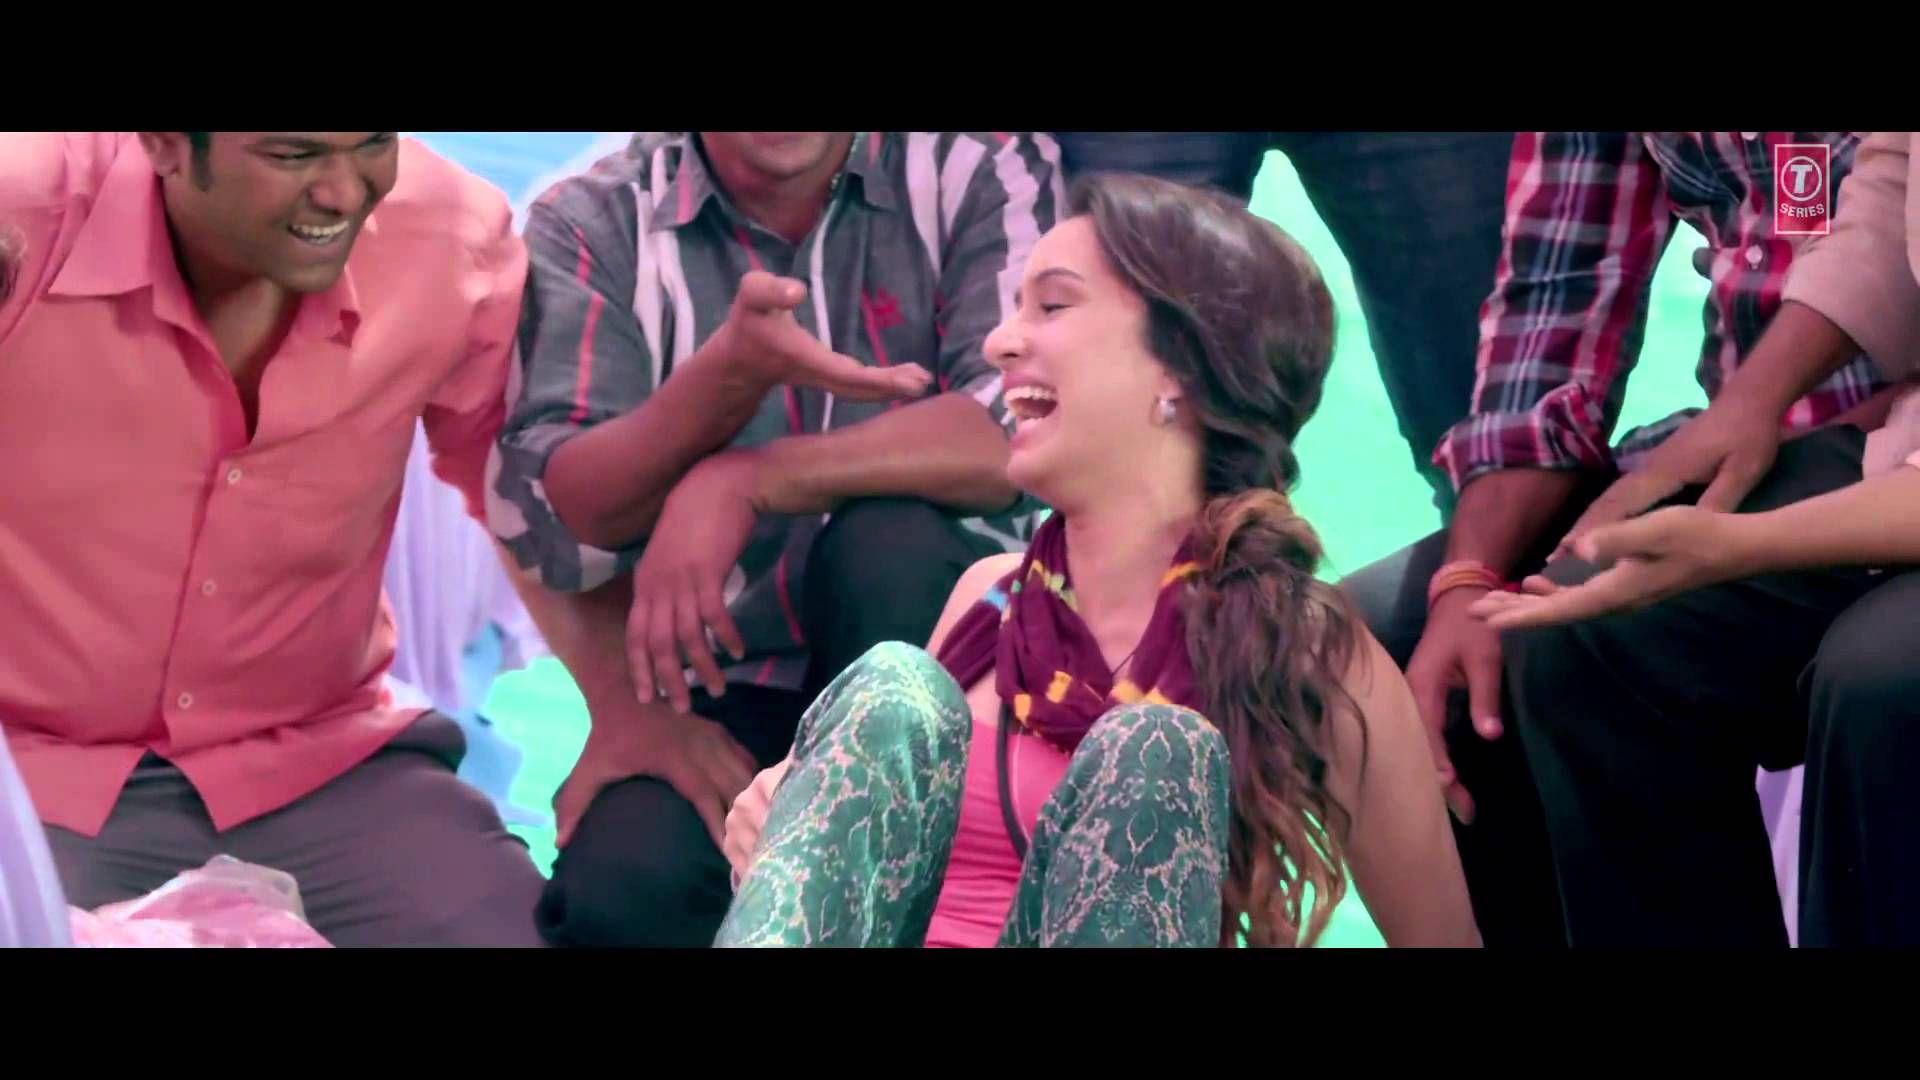 Ek Villain Banjaara Full Video Malhotra xxxx - YouTube